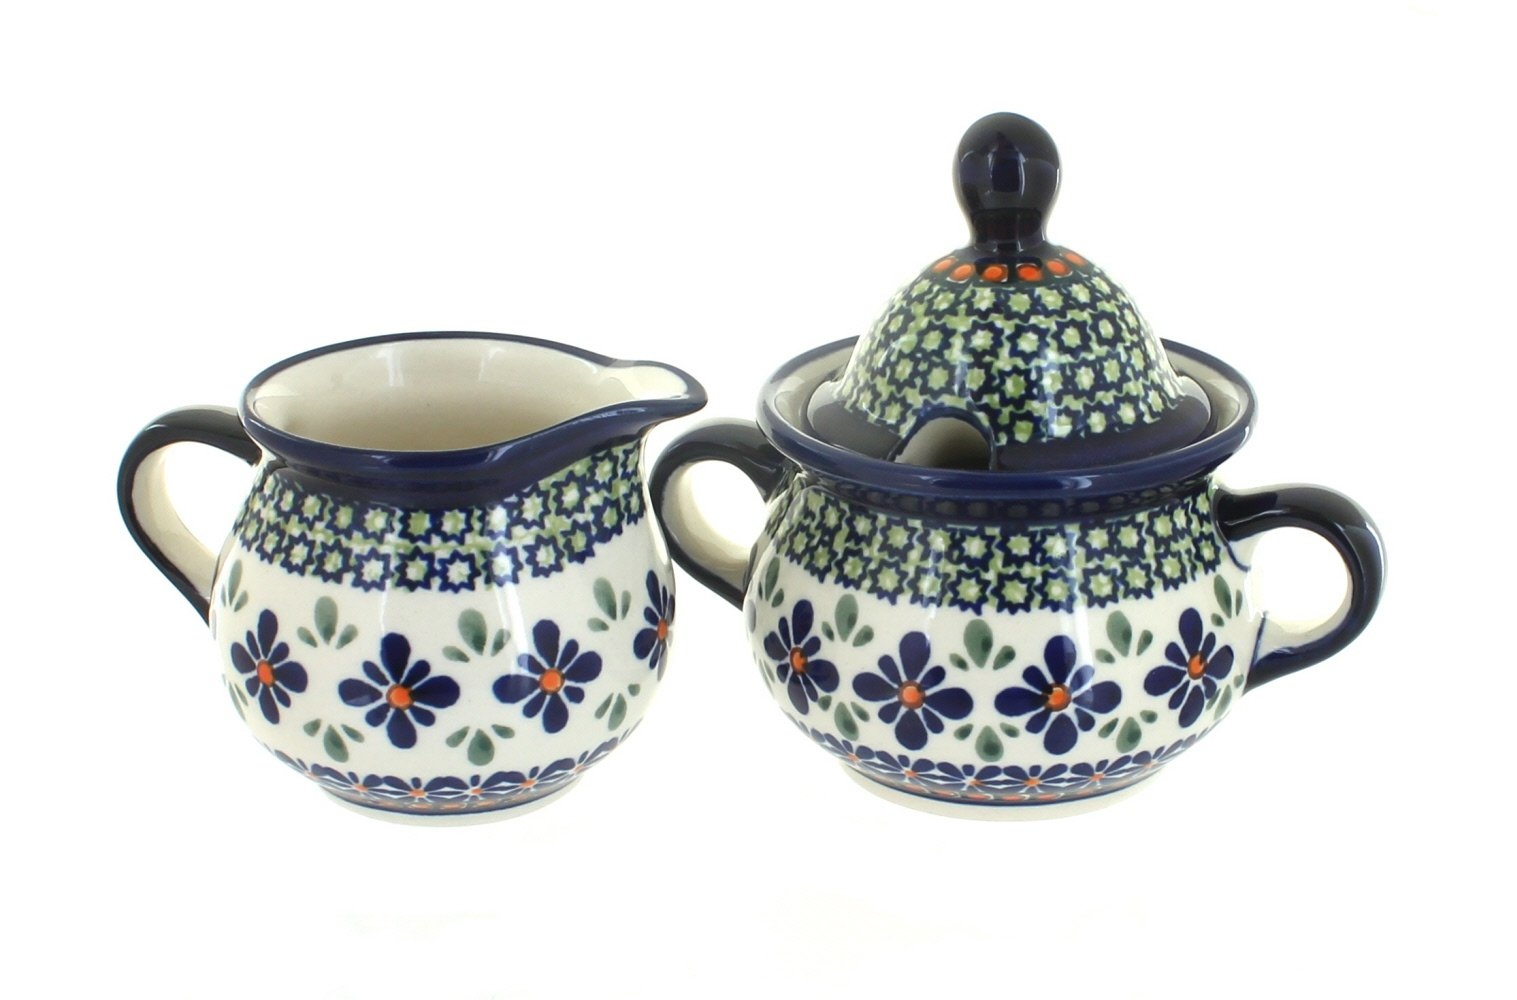 OKSLO Polish pottery mosaic flower sugar & creamer set